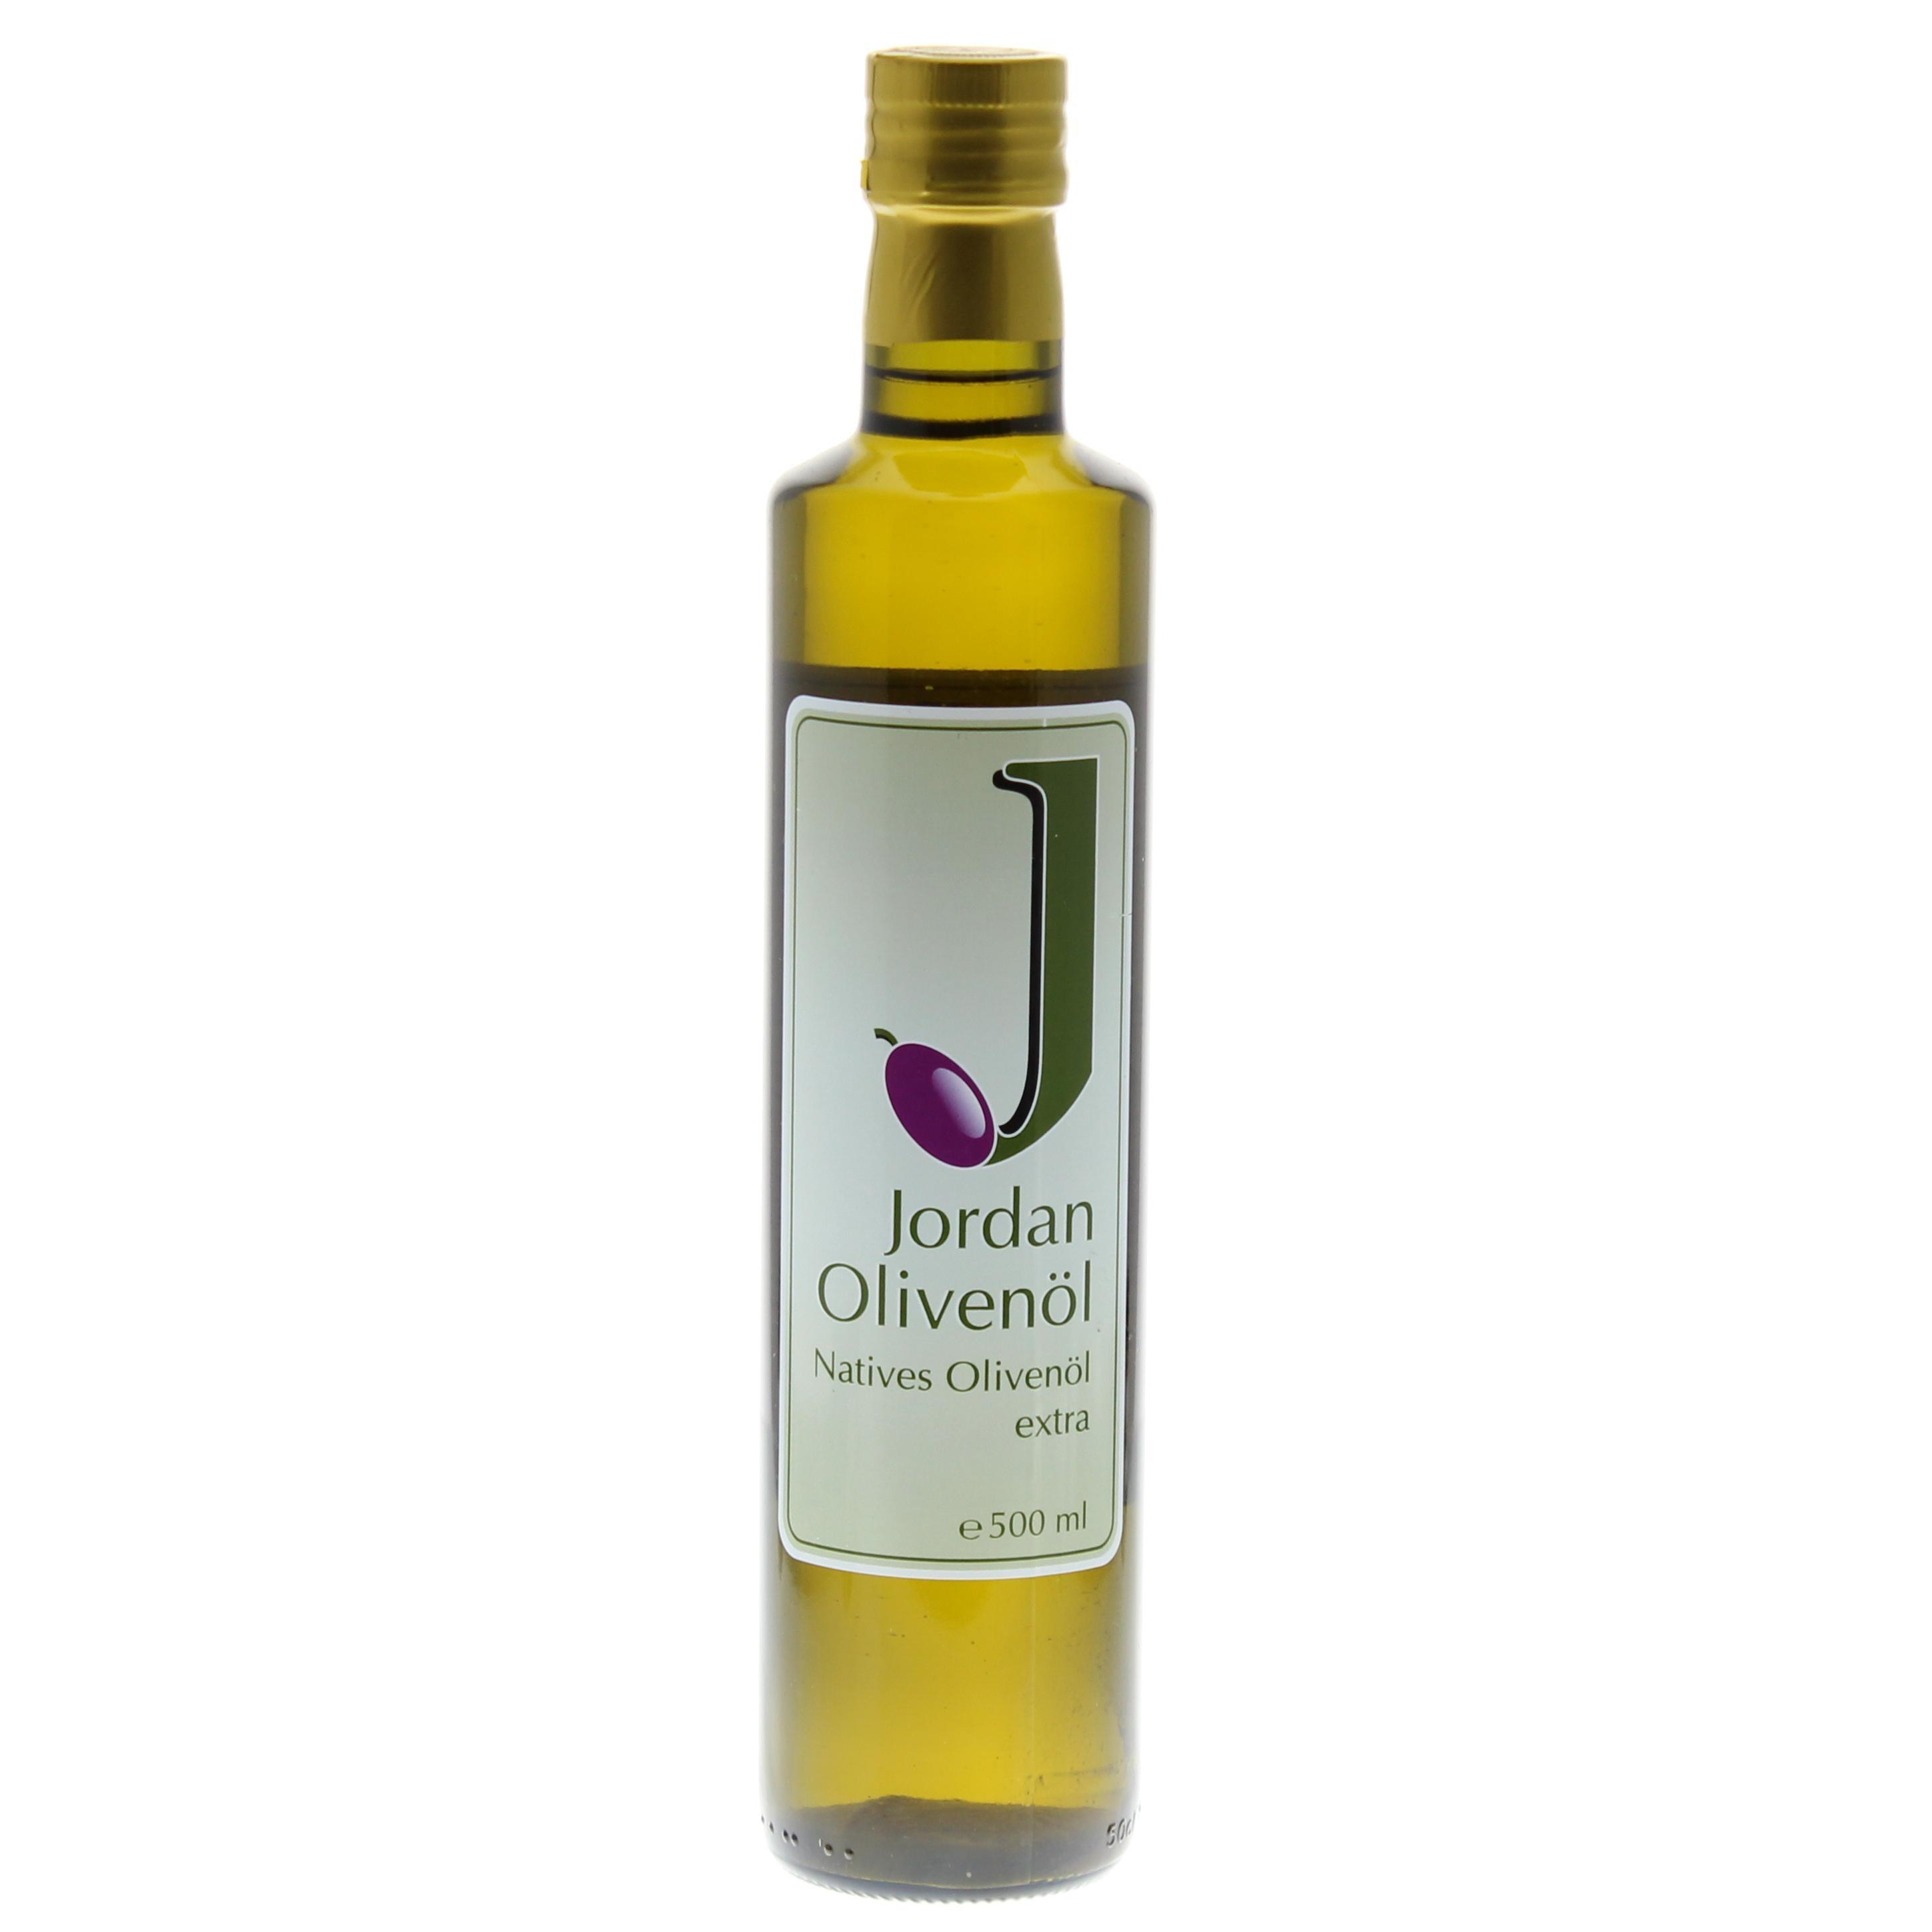 sale usa online reputable site hot sale Jordan - Natives Olivenöl extra Premium-Qualität Speiseöl Öl - 500ml